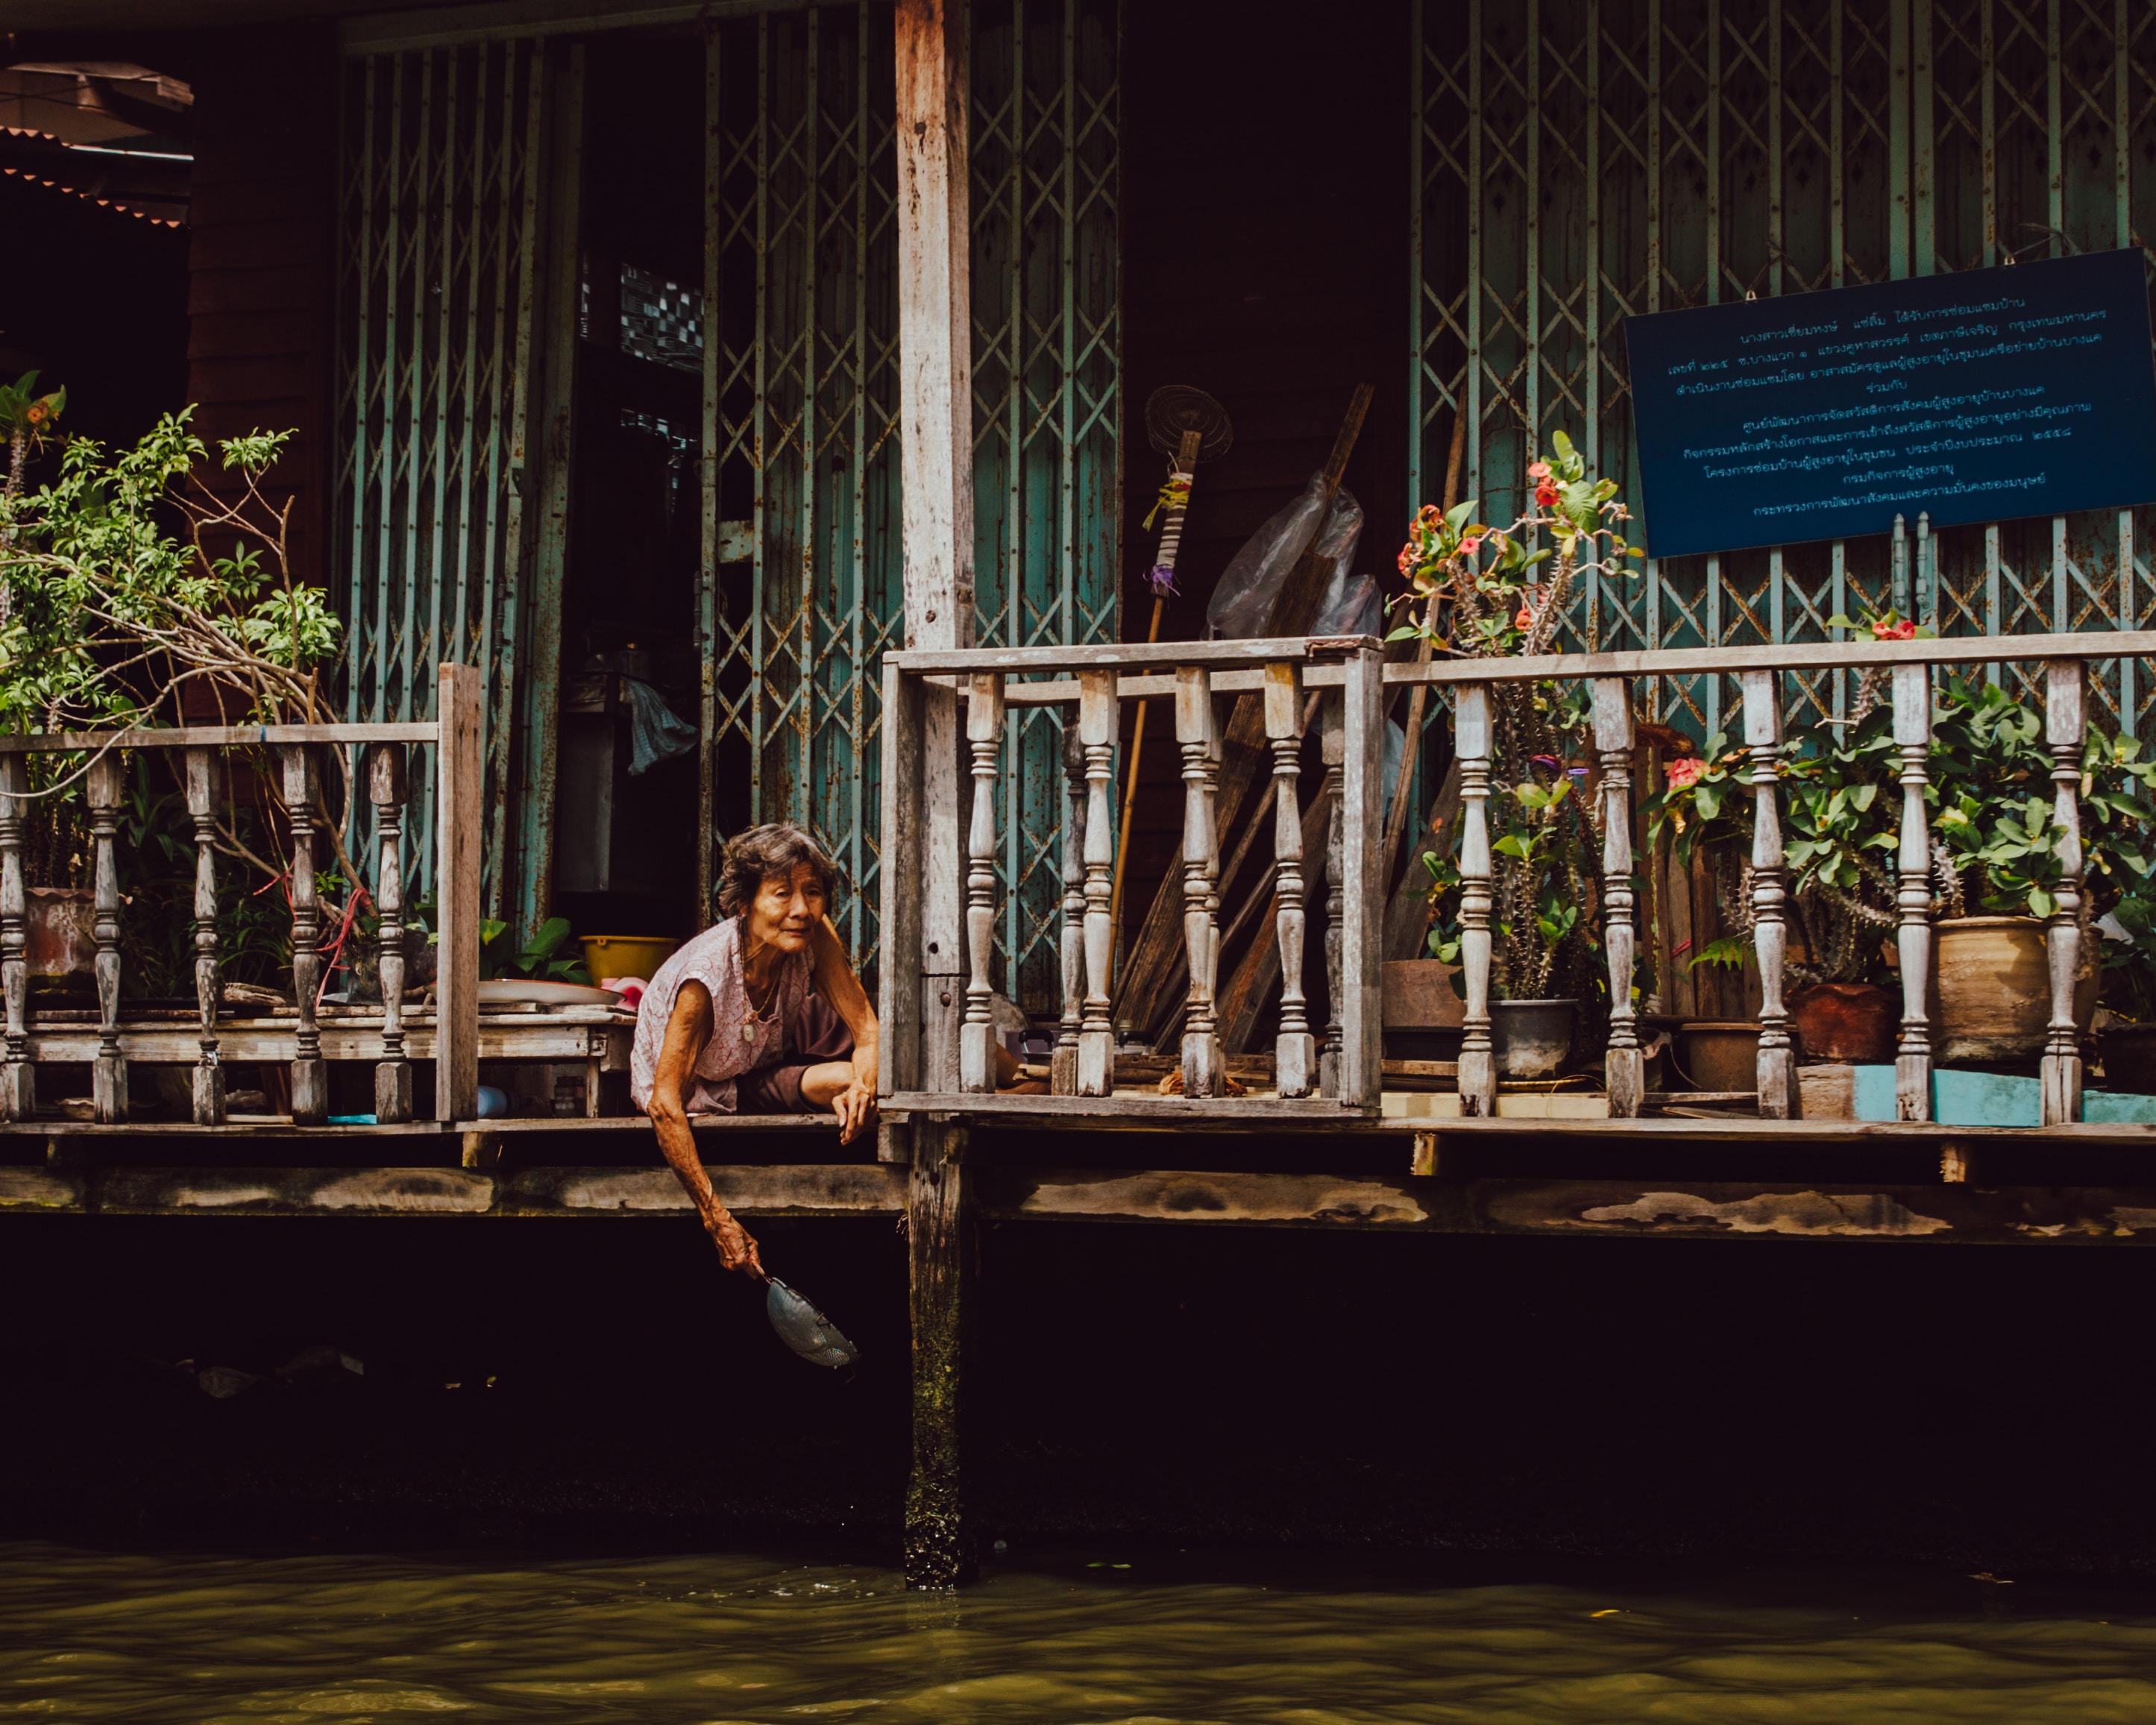 woman sitting on floor beside balusters